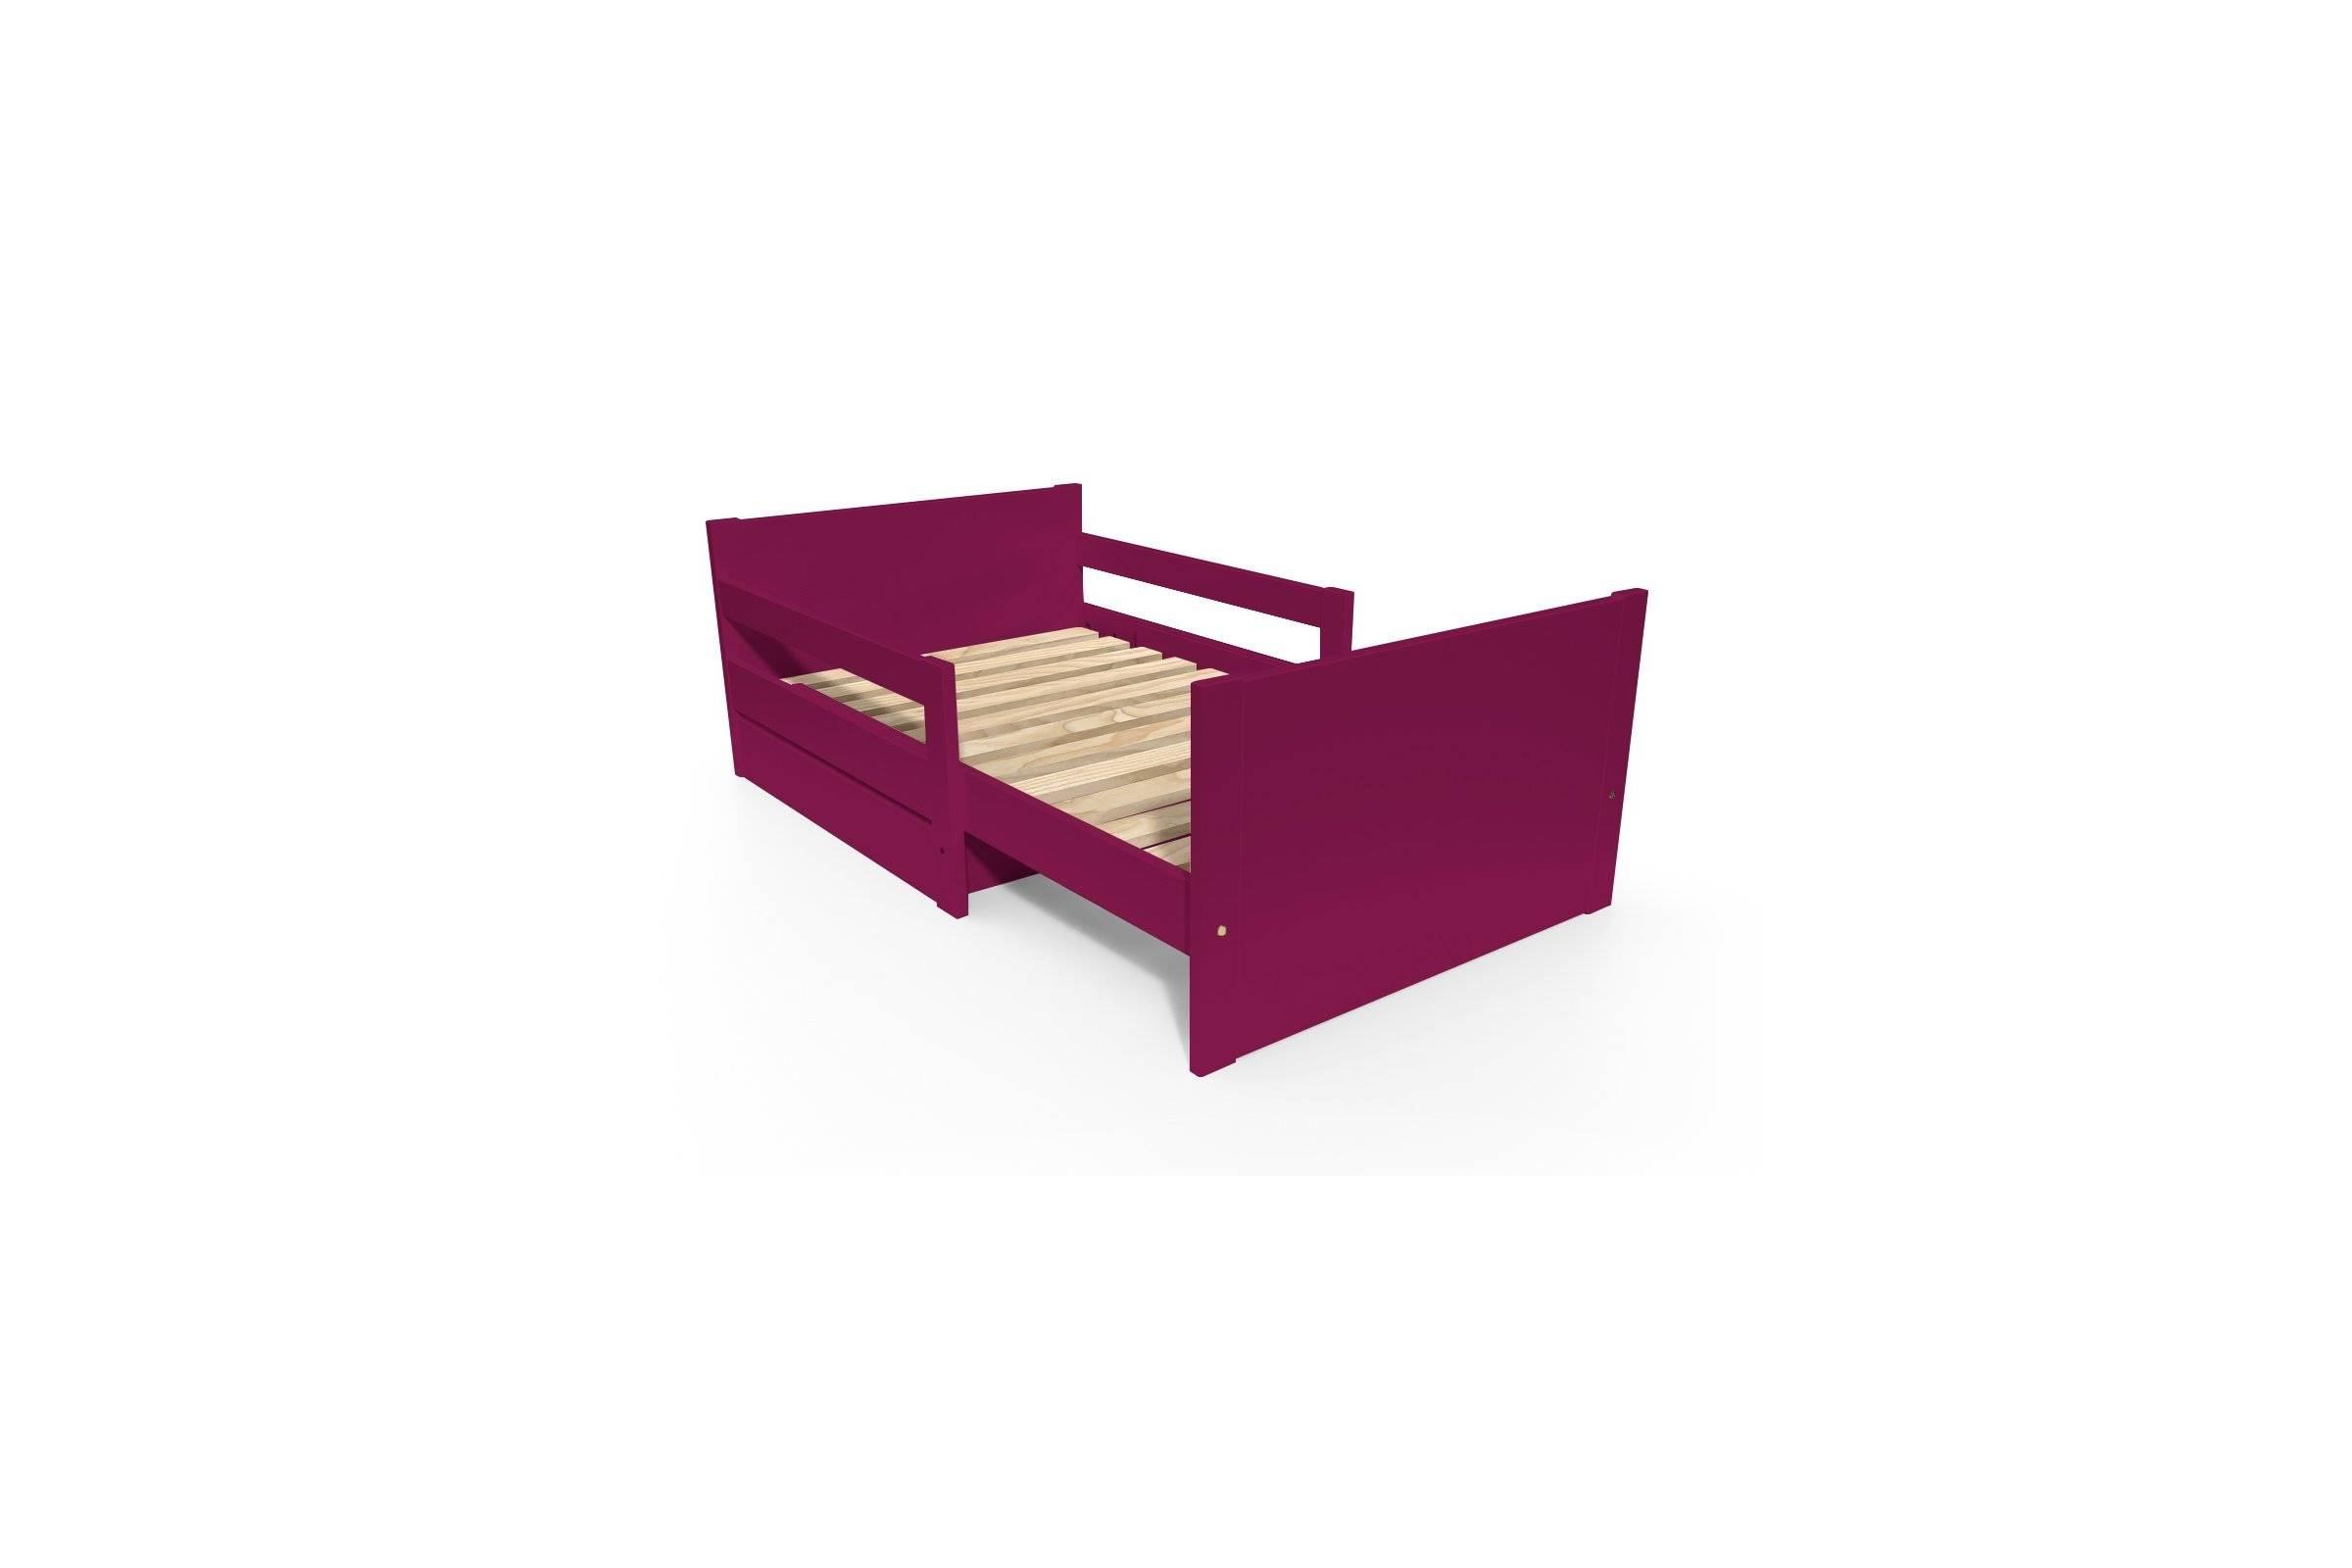 Abc meubles - lit évolutif enfant avec tiroir bois prune 90 x (140/170/200)